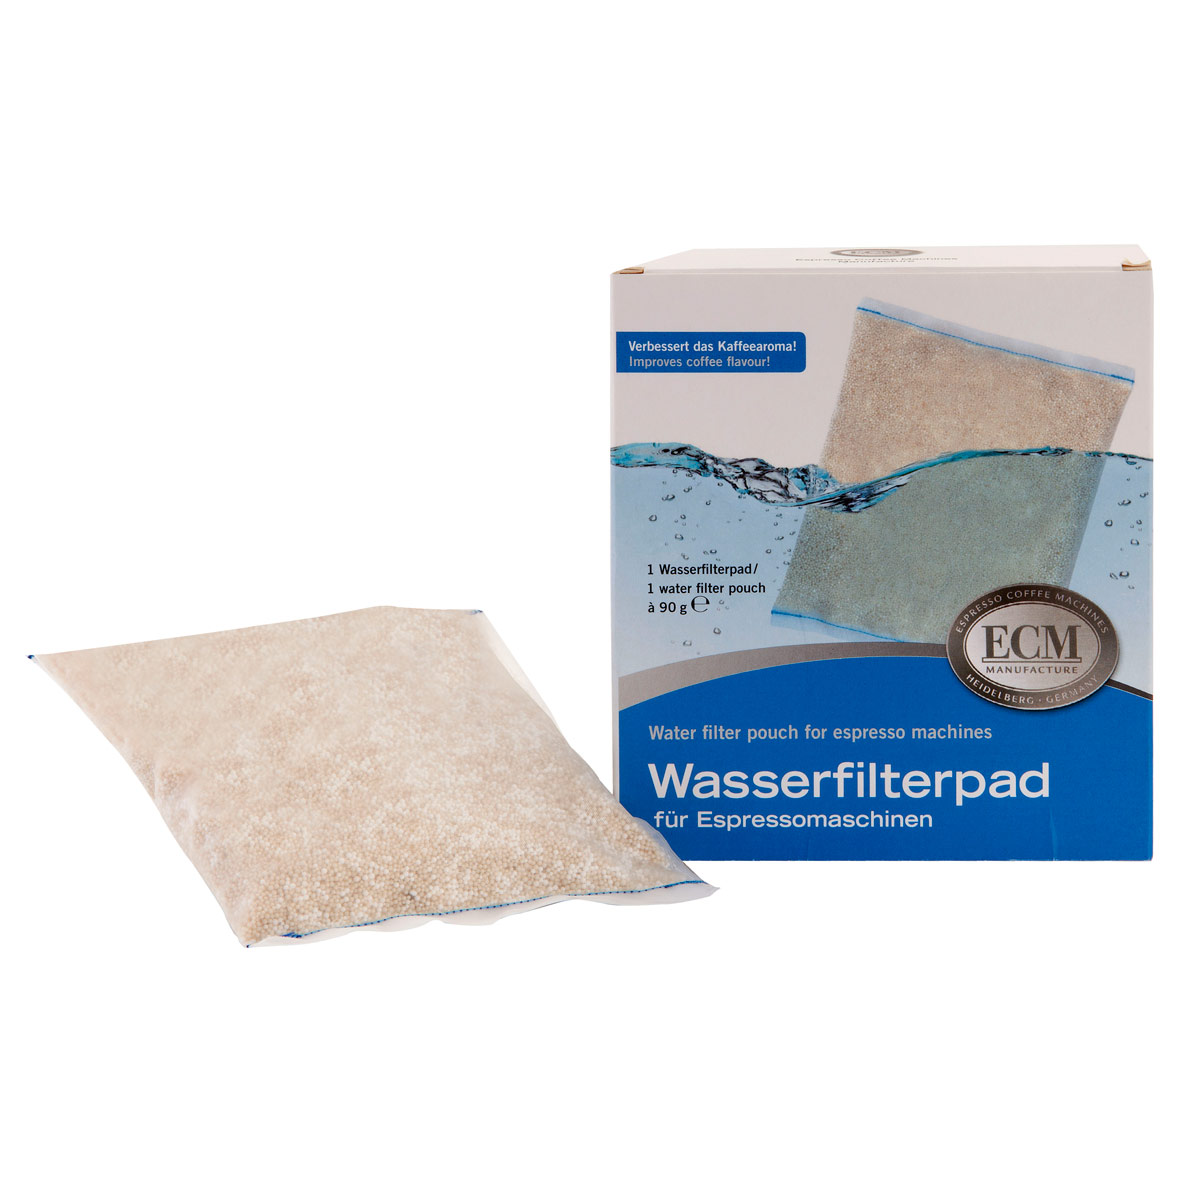 ECM Water Filter Pouch for Espresso Machines, 1 pk. #89440